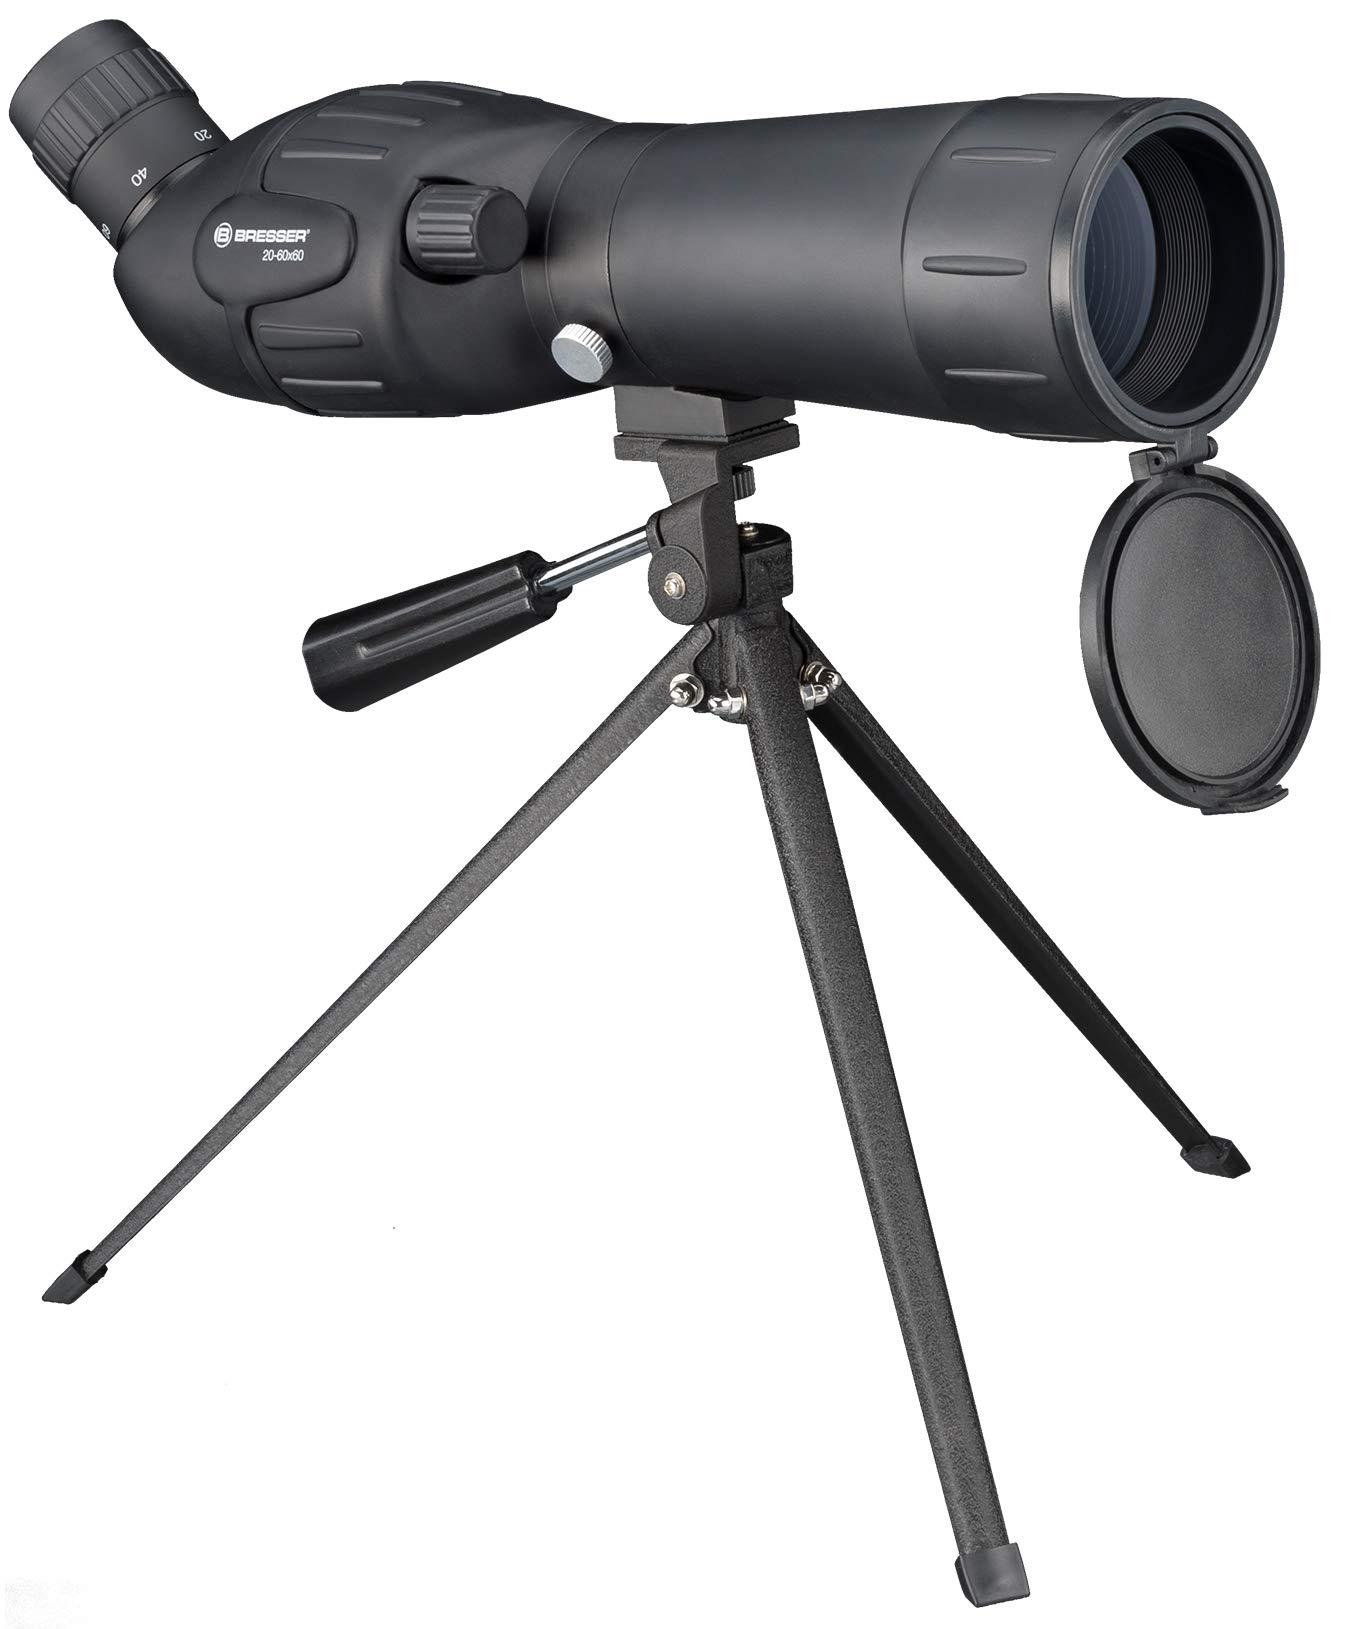 Bresser Junior Spotting Scope Spotty 20-60x60 Zoom by Bresser